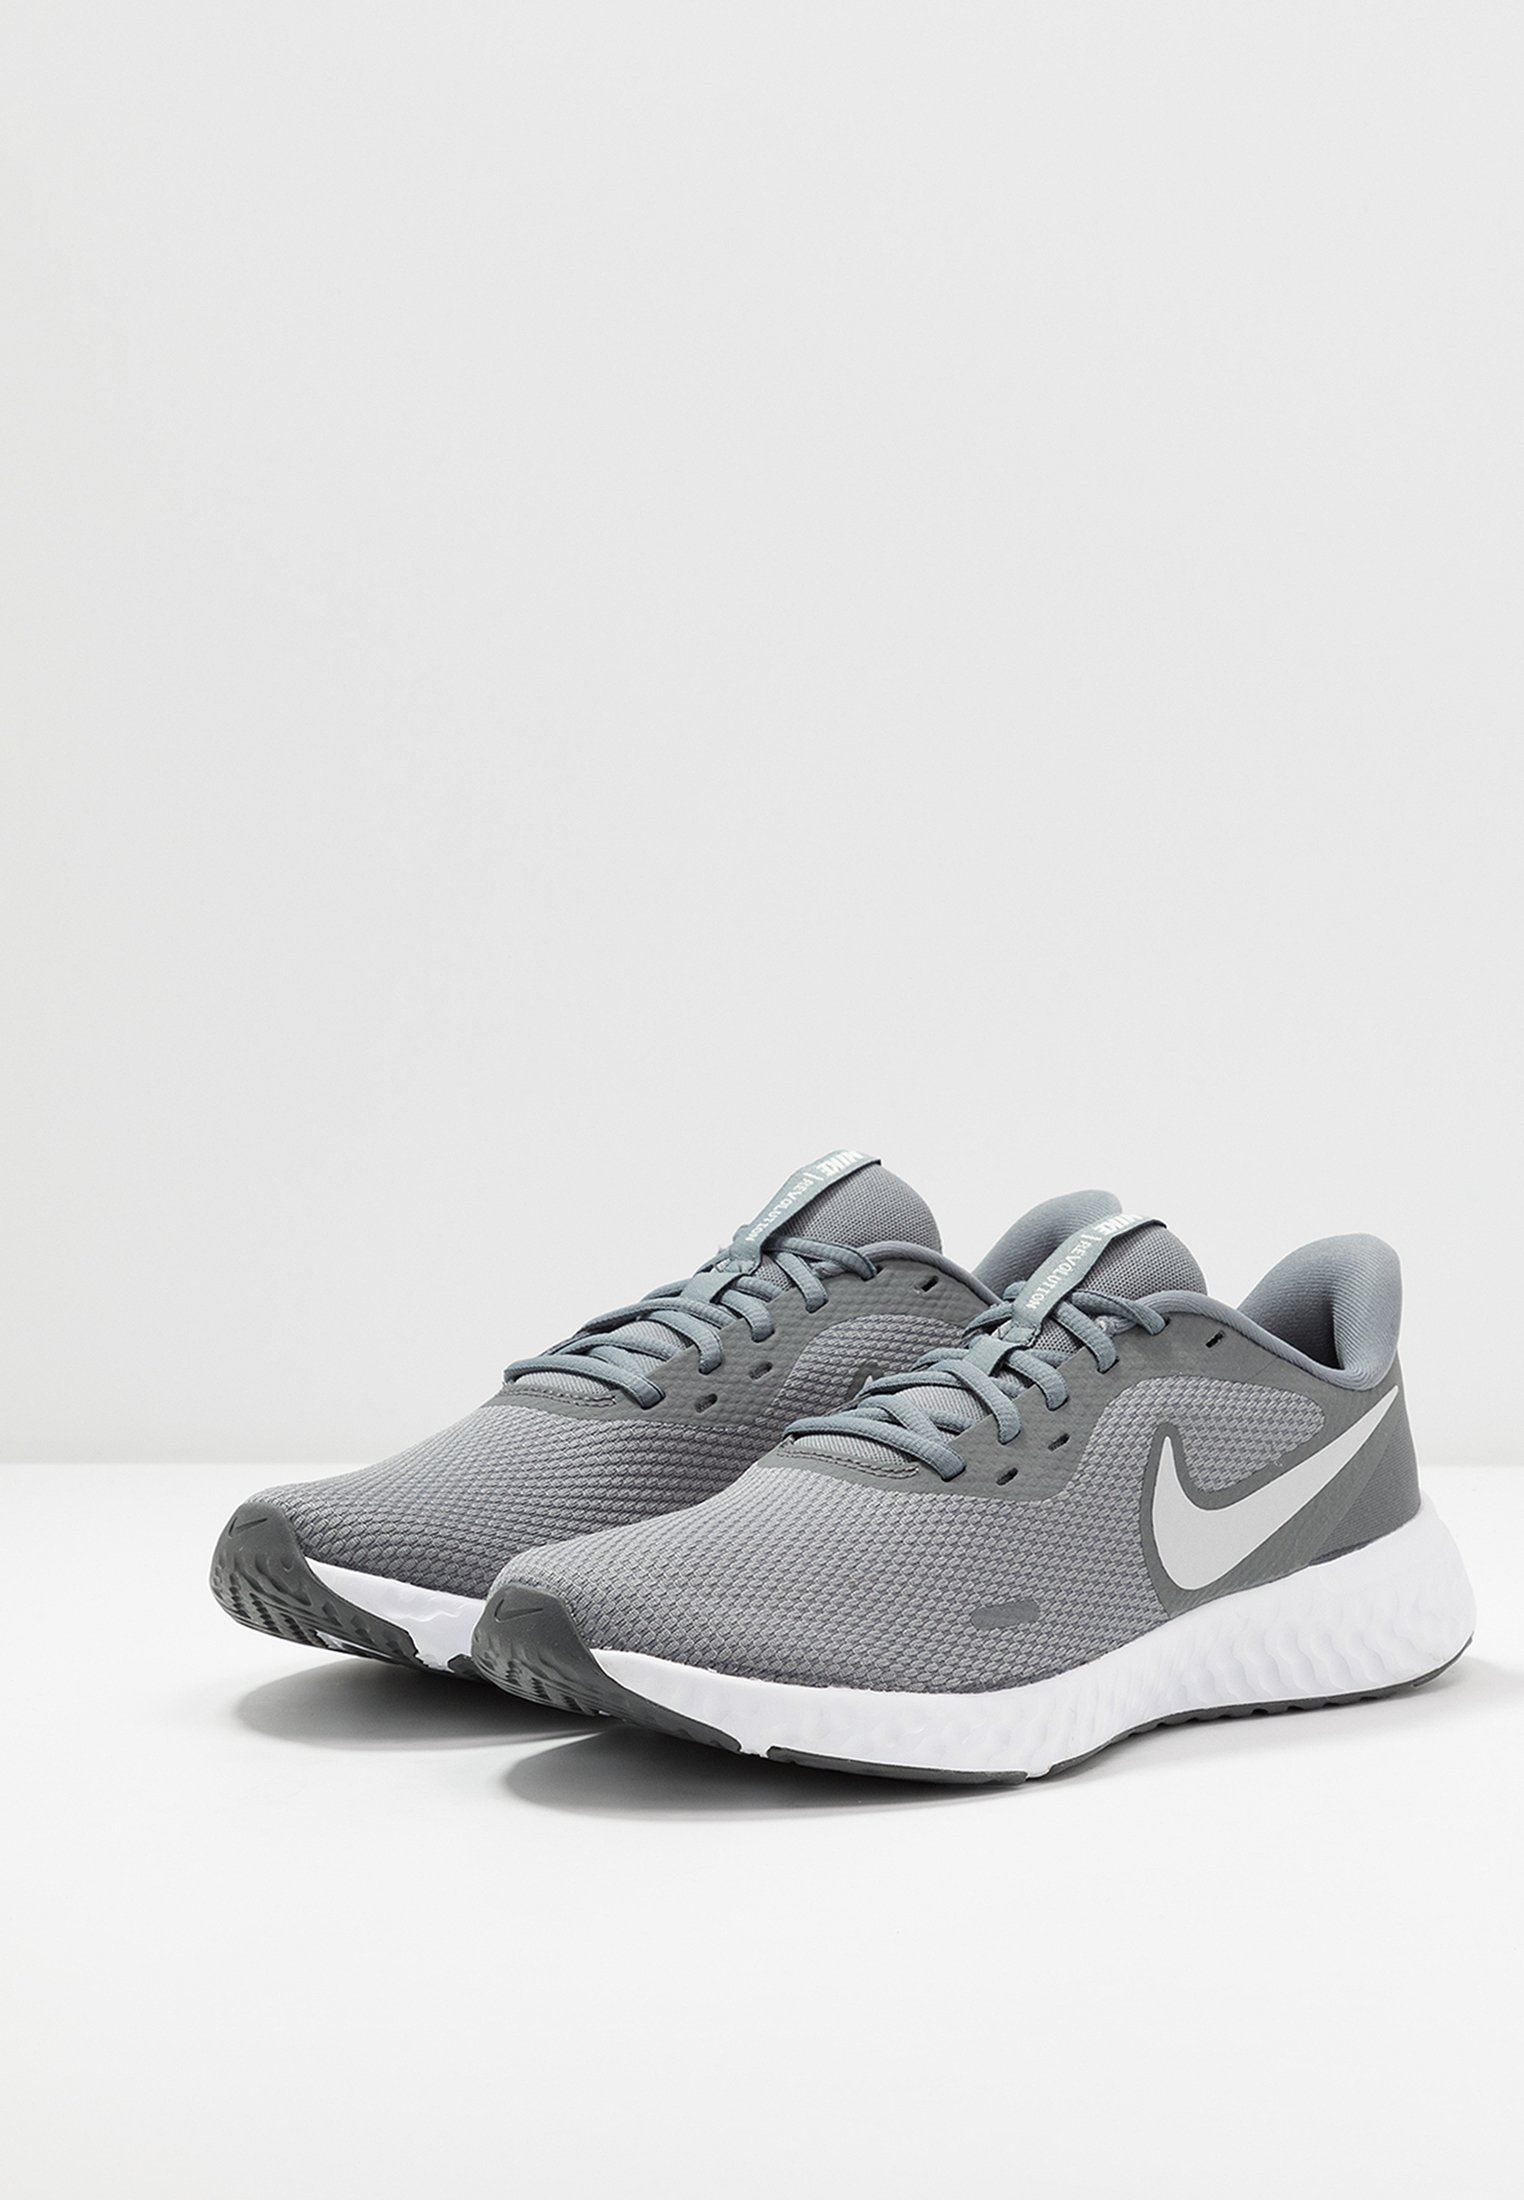 Nike 5Scarpe Performance dark Neutre Grey pure Running Cool Grey Revolution Platinum shdQCtrBx